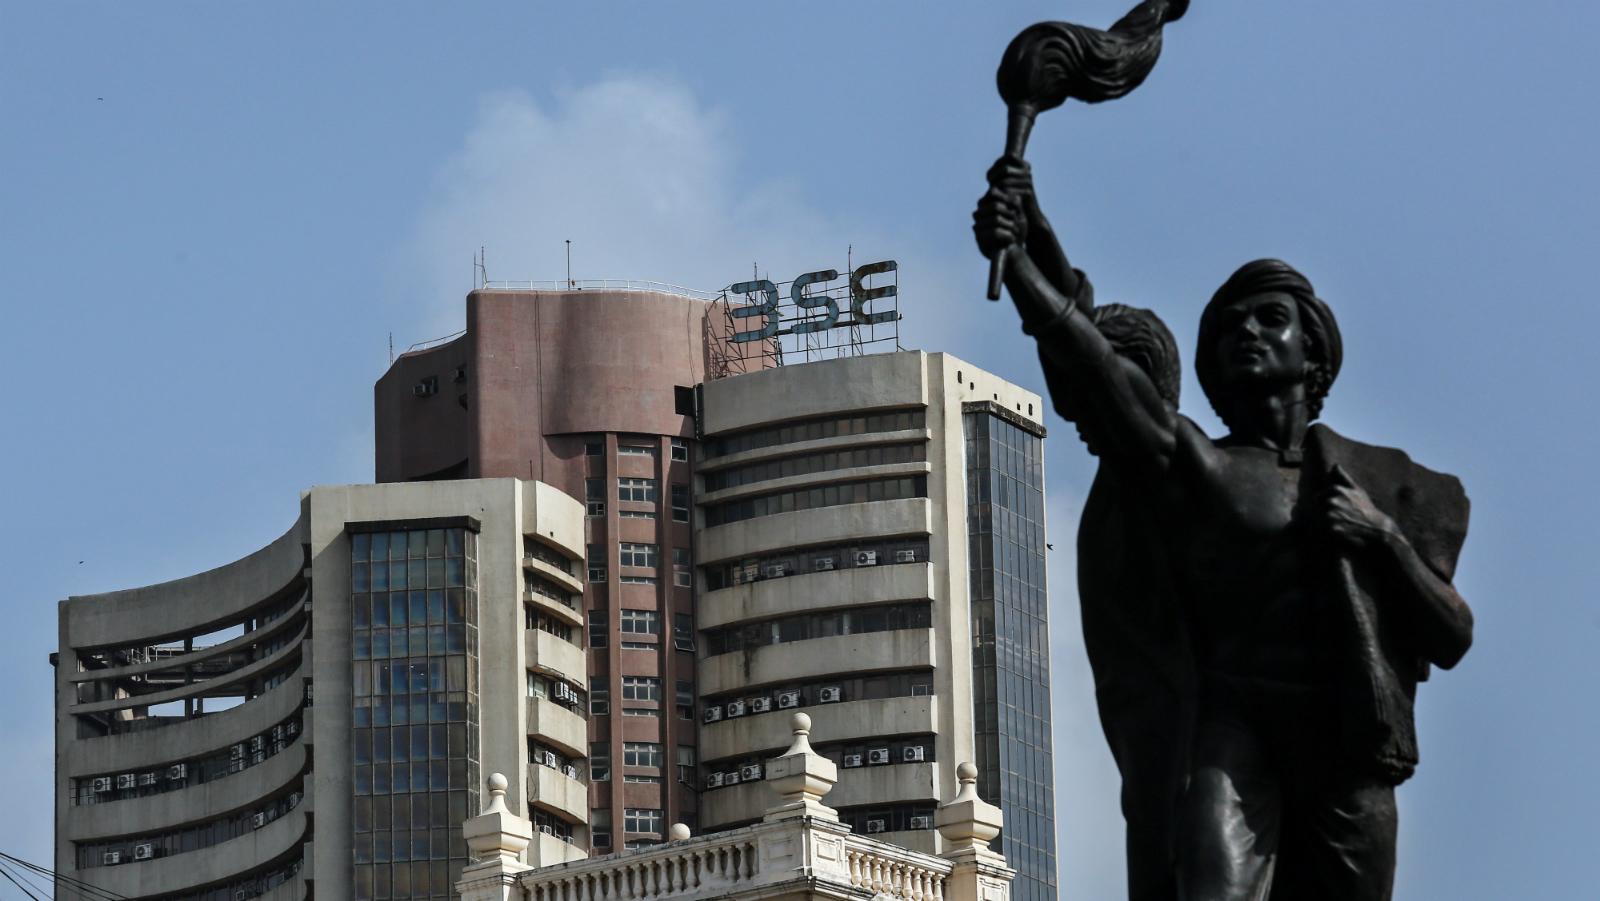 India-BSE-IPO-Stock exchange-Sensex-Business